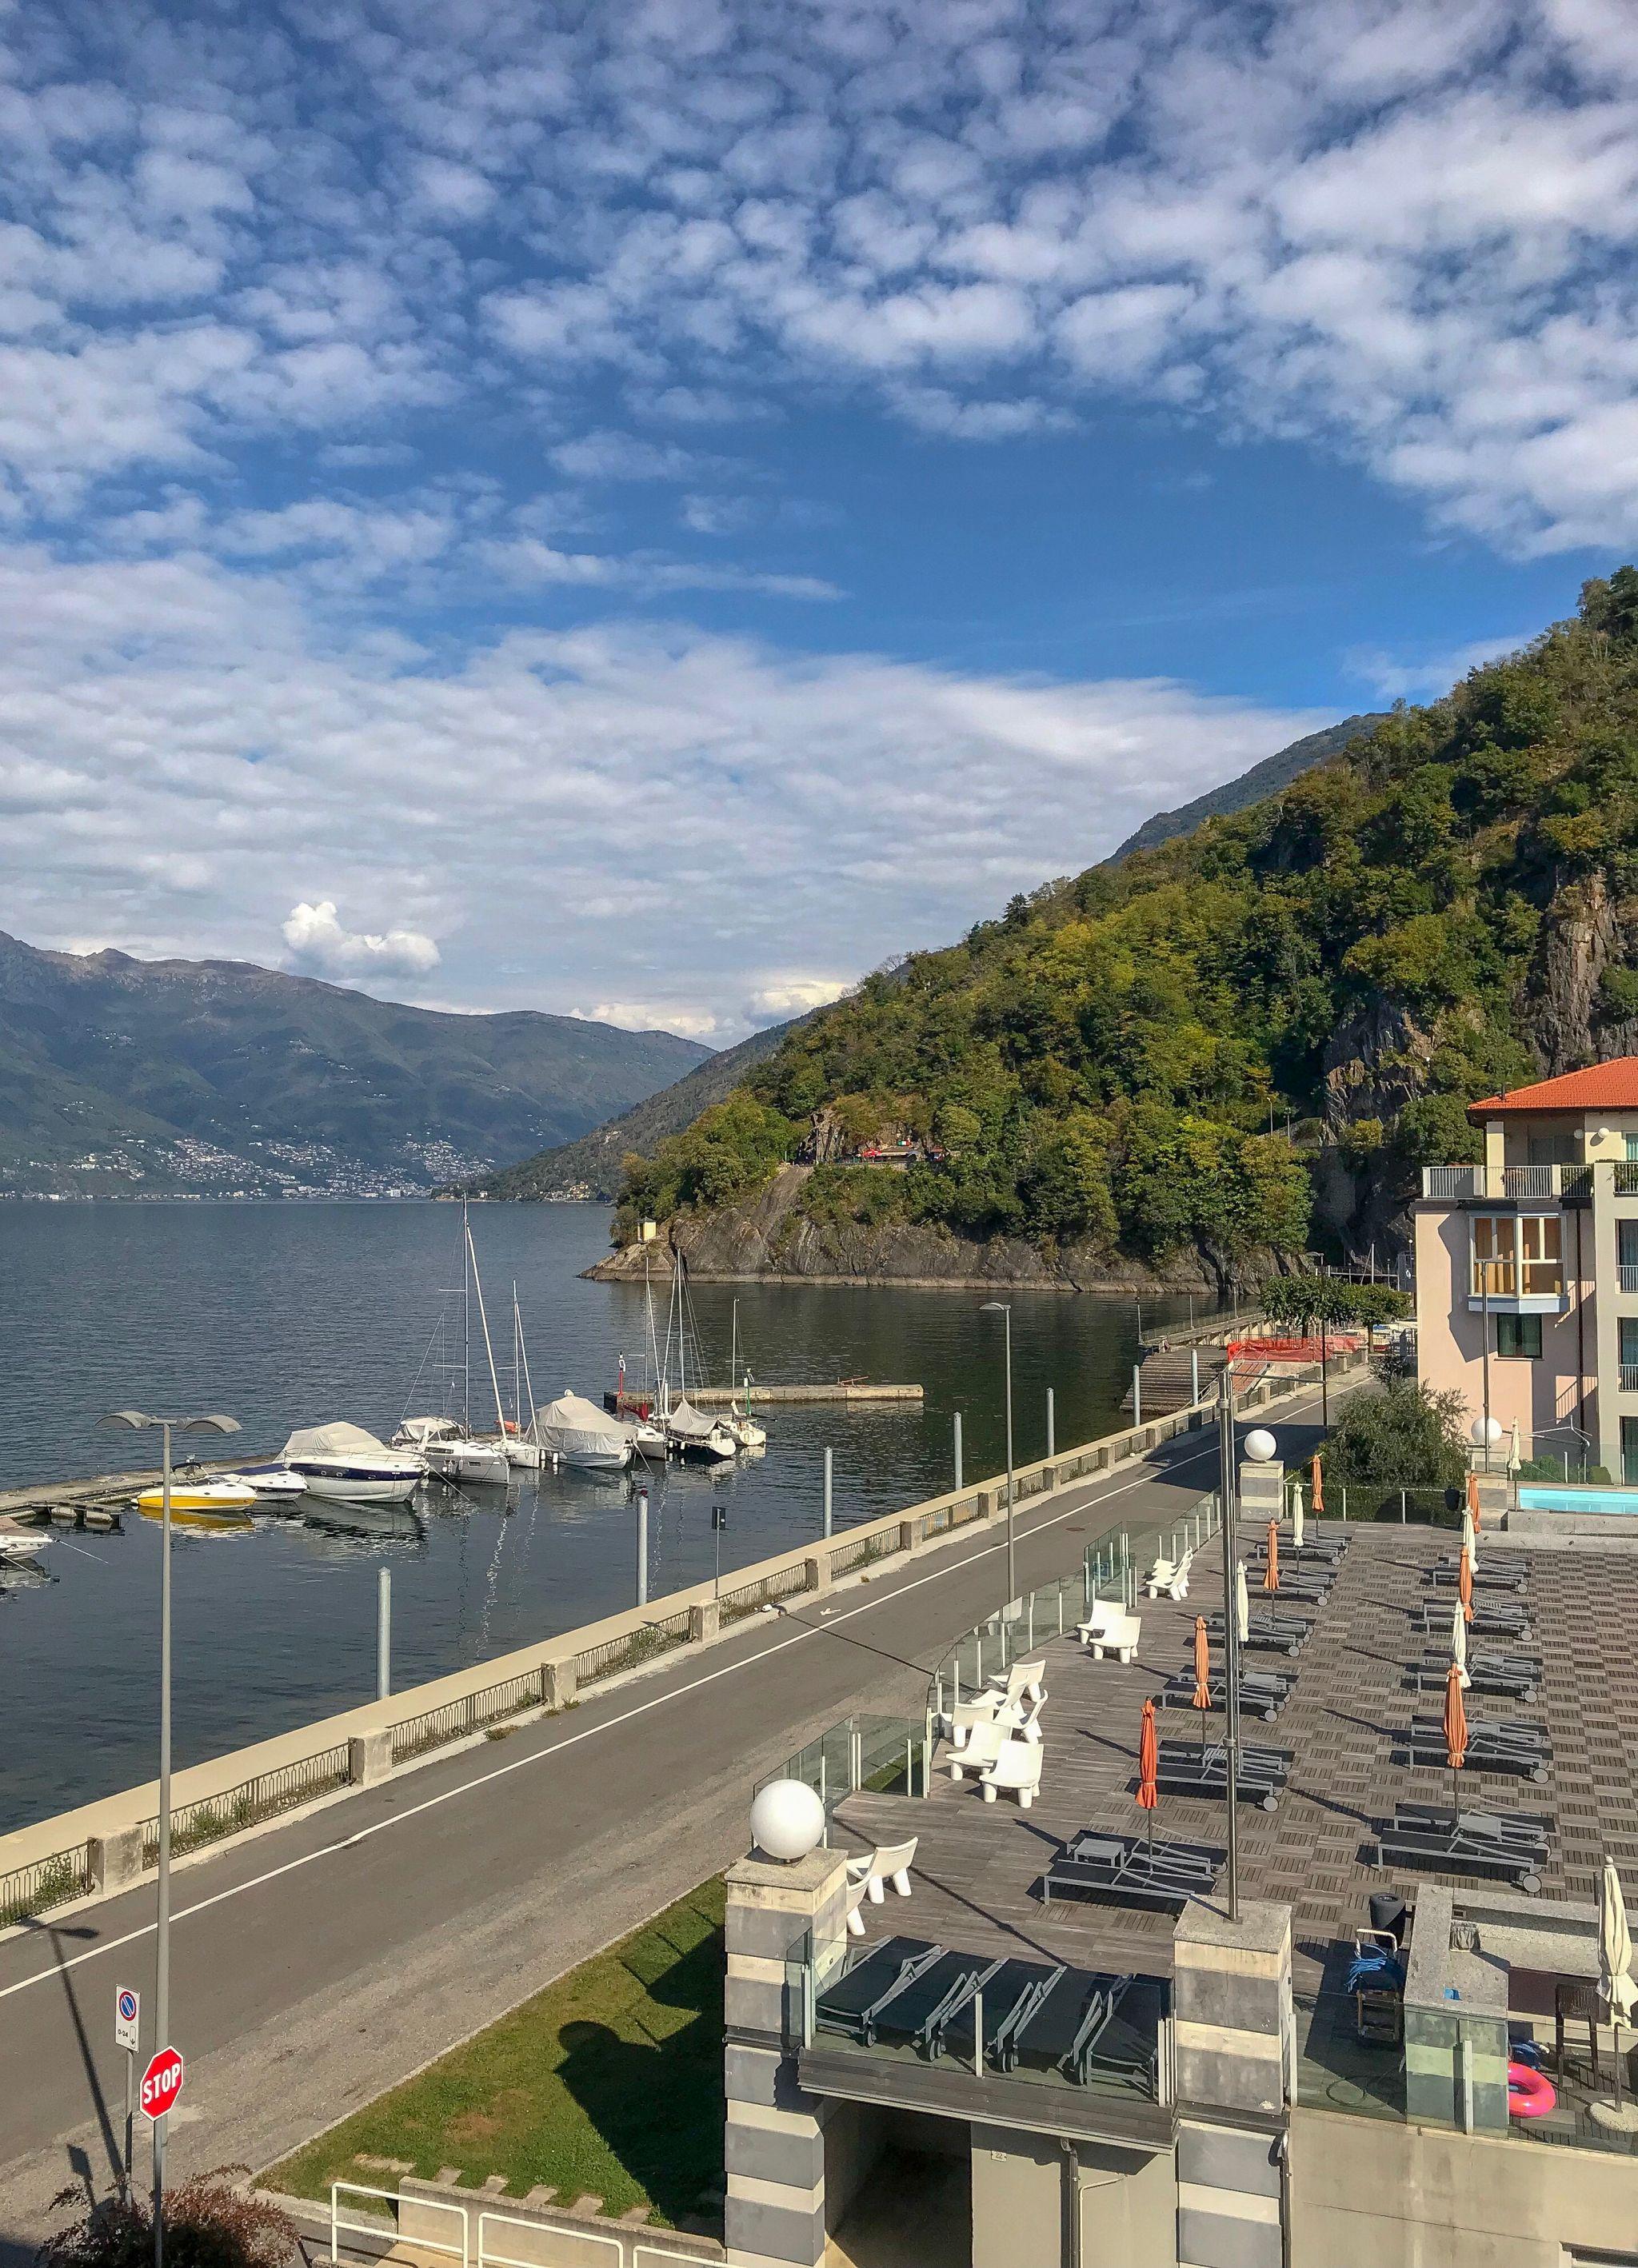 Golfo Gabella Resort overlooking Lake Maggiore Italy